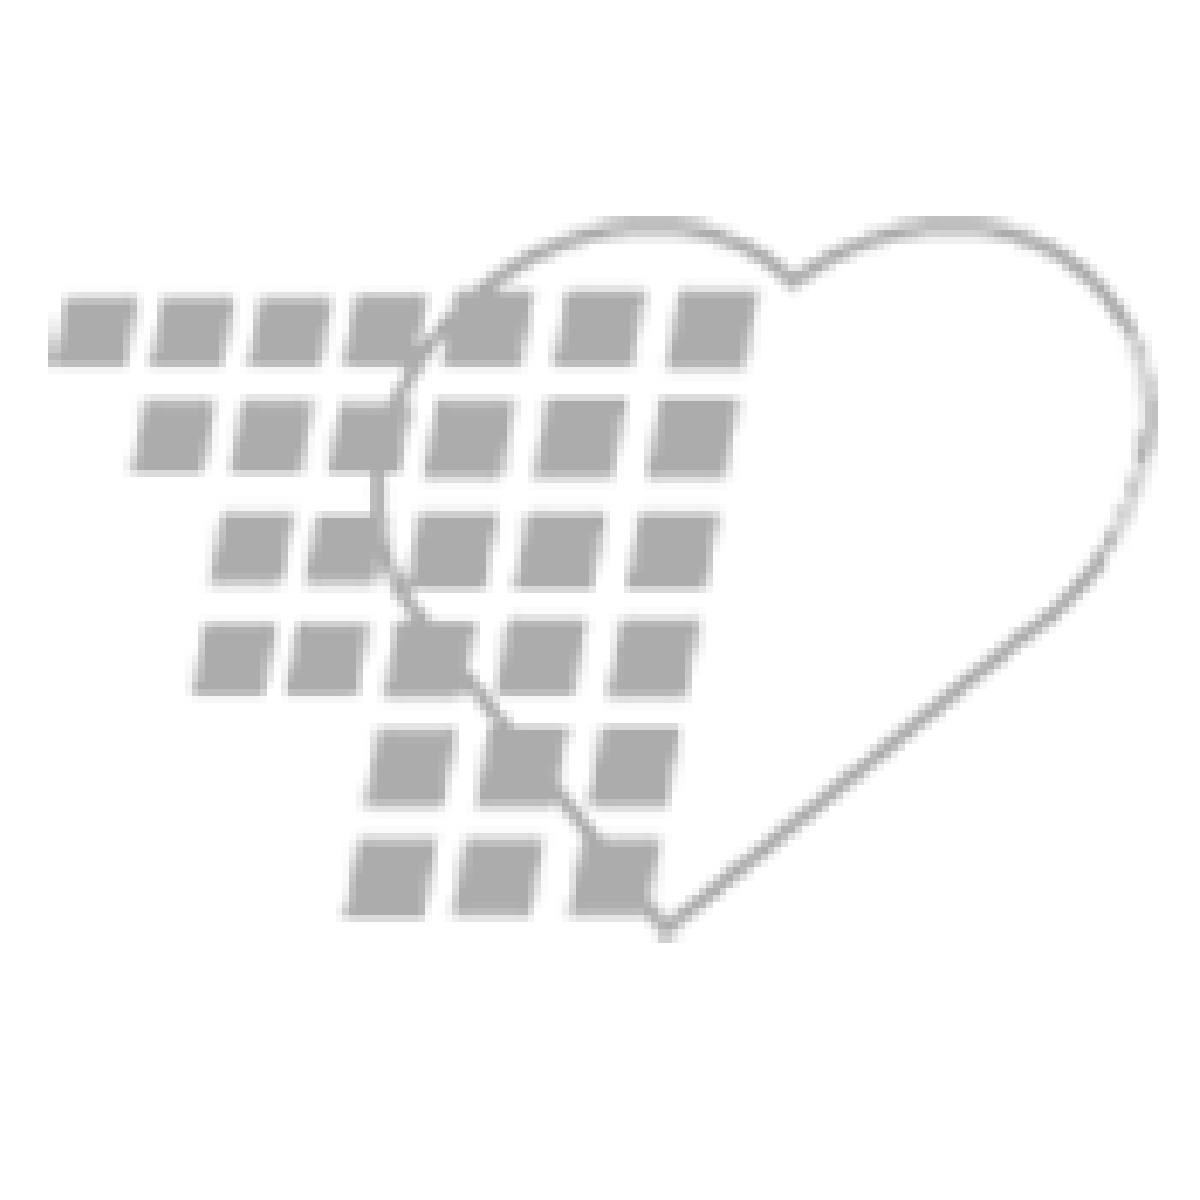 06-93-8505 - Demo Dose® Naloxon Hydrochlorid (Narcn) 2mg/2mL